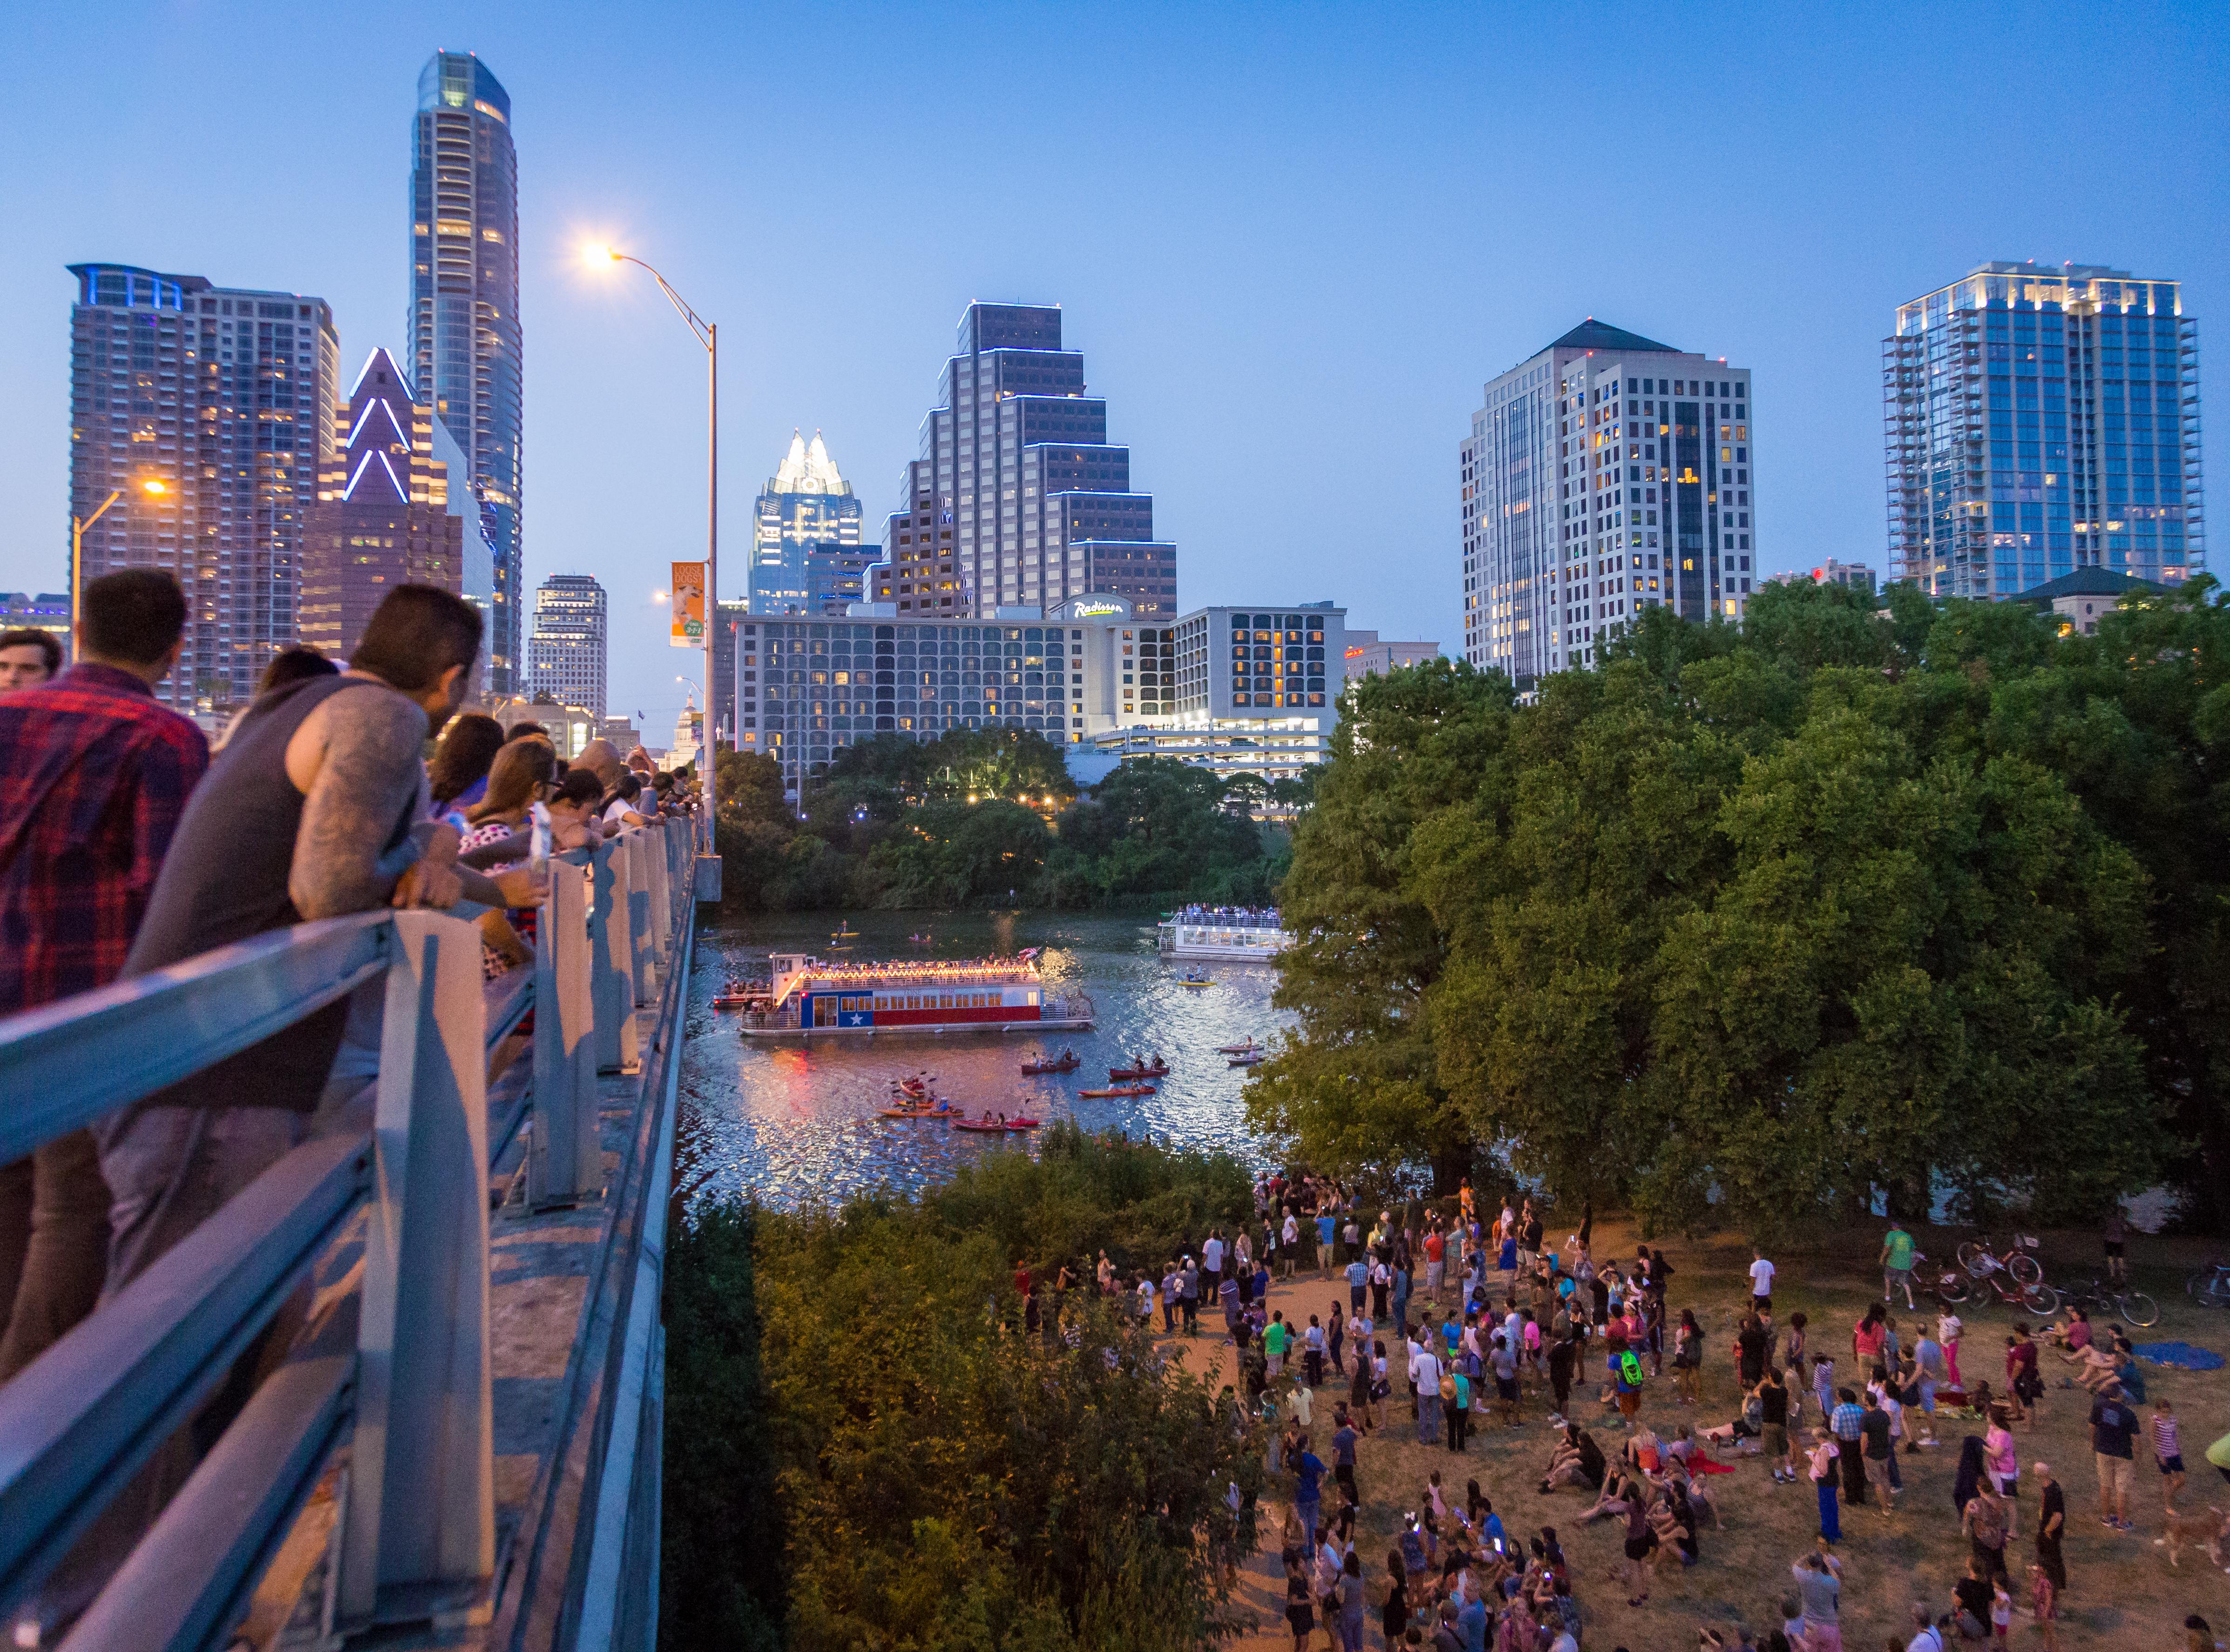 Austin Texas Karte.Plan A Trip To Austin Tx Travel Information Maps Visitors Guide